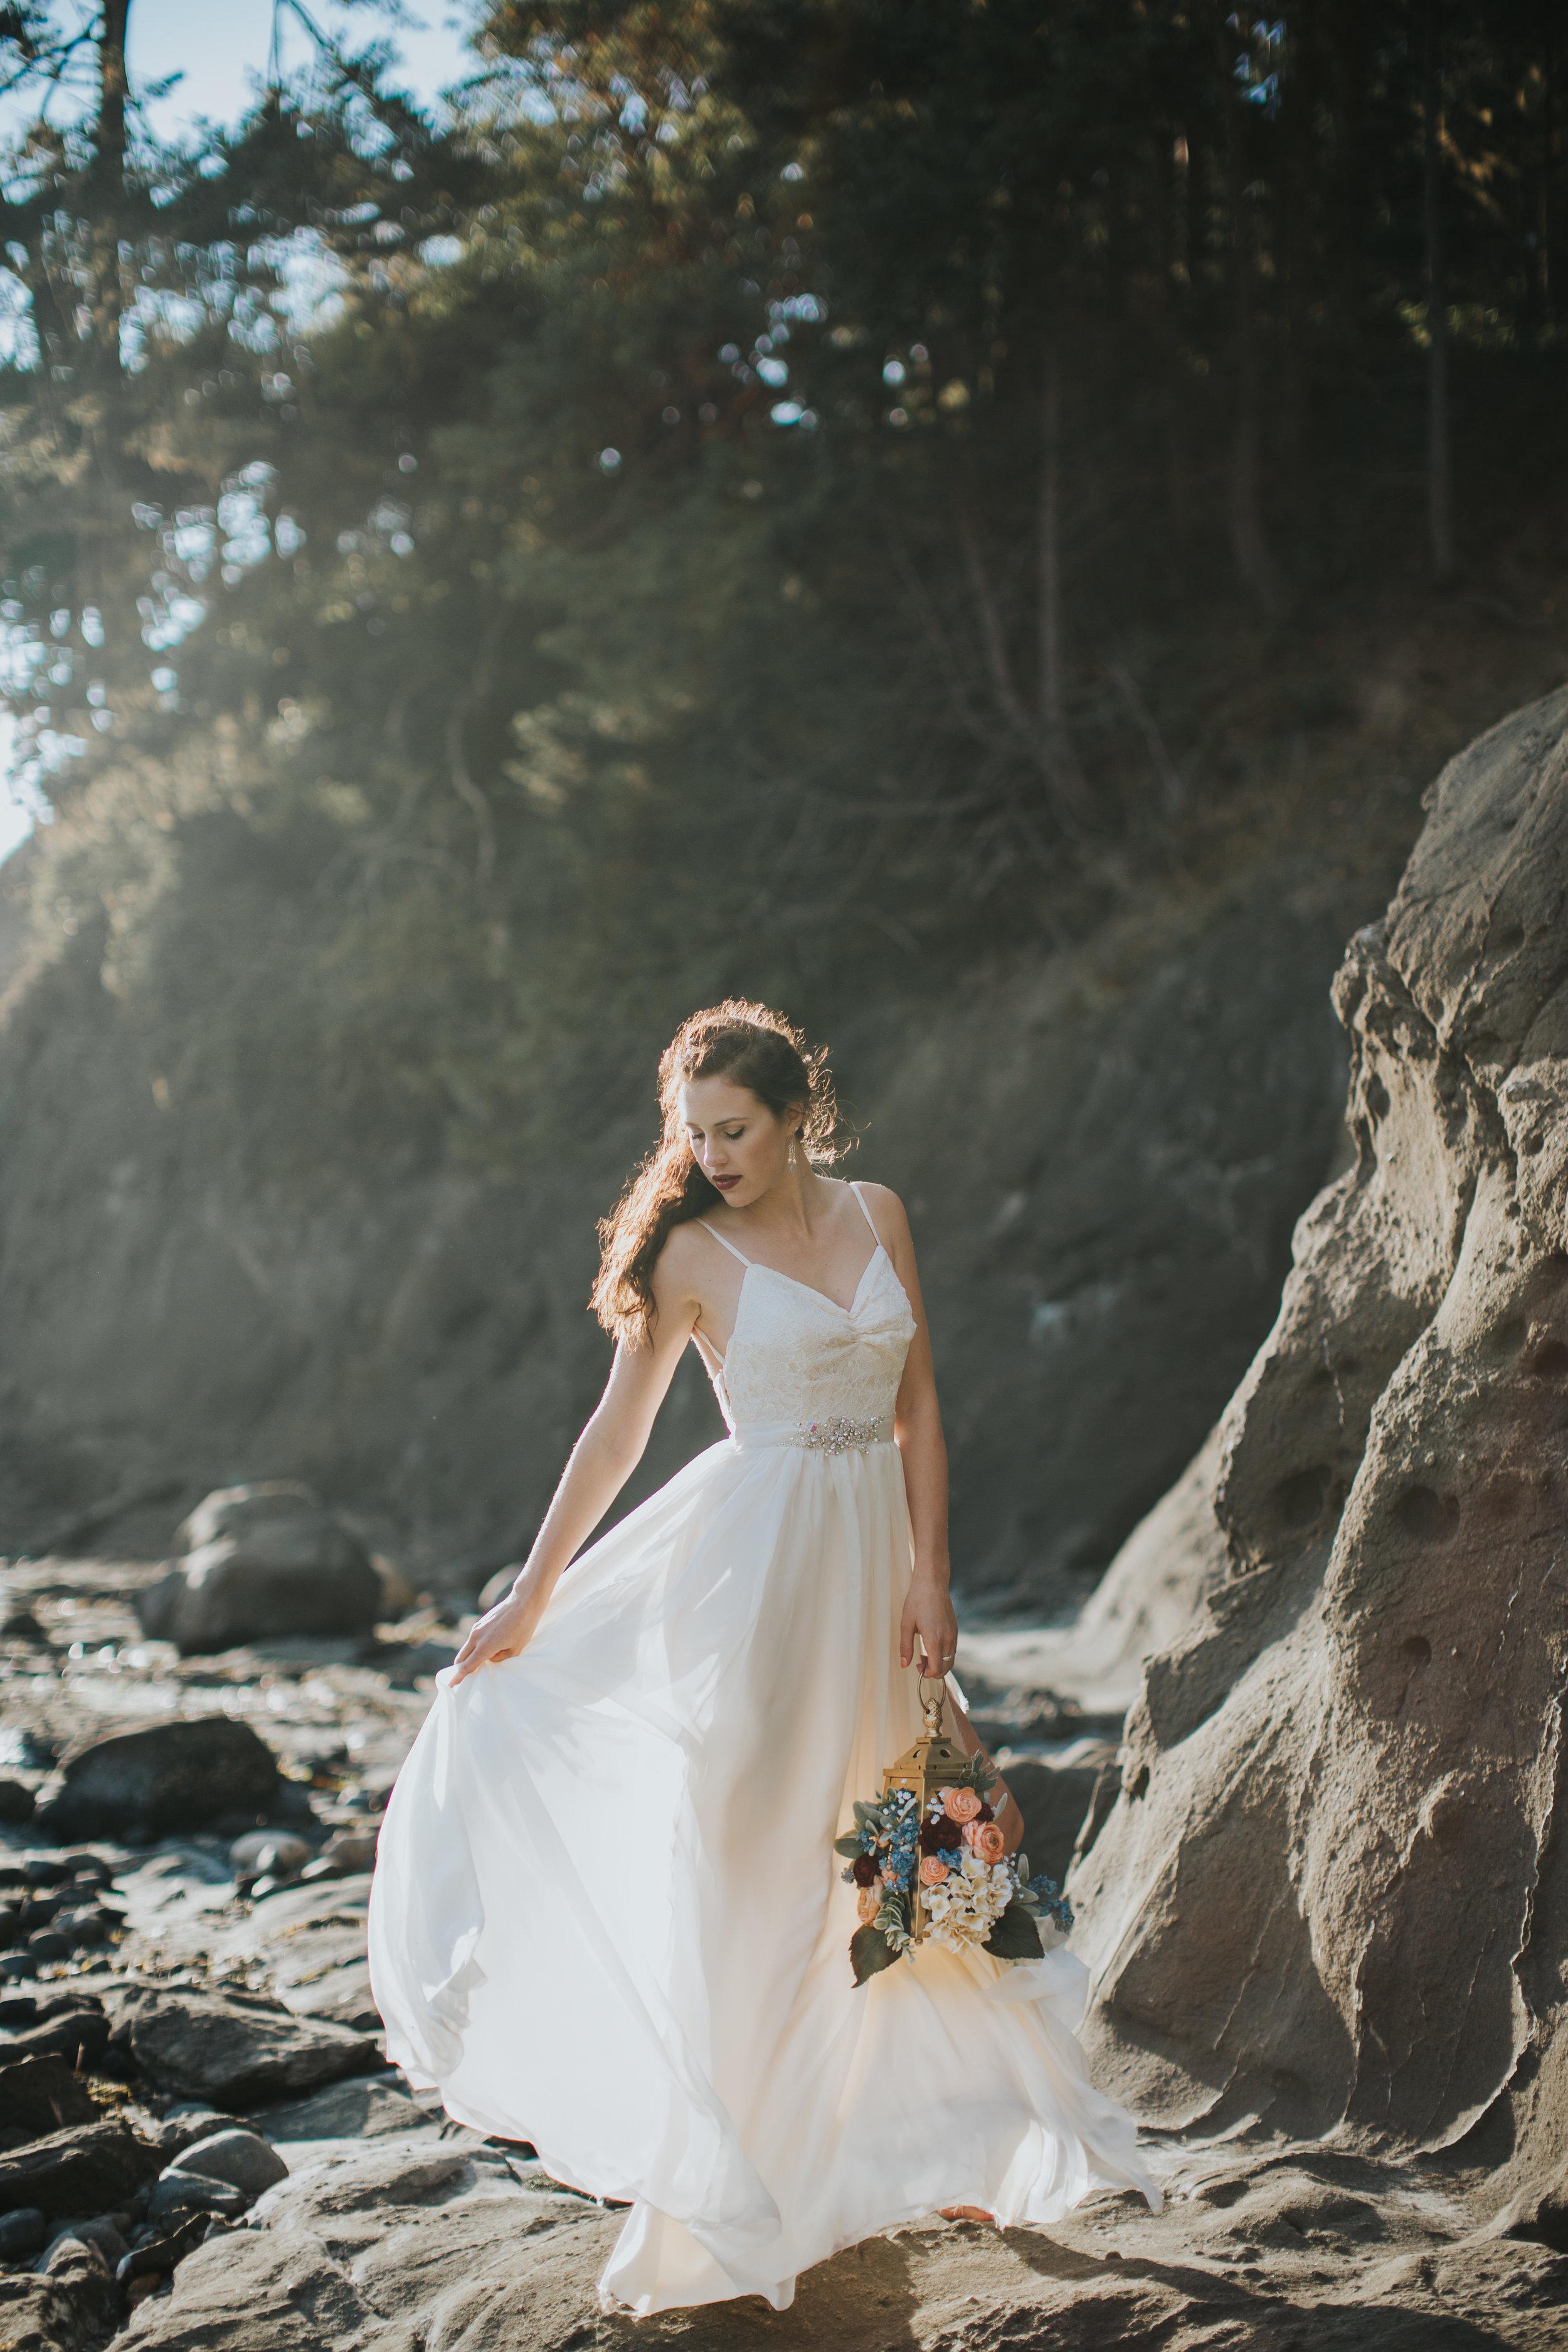 Port-Angeles-Salt-Creek-beach-wedding-bride-PNW-olympic-peninsula-photographer-Kayla-Dawn-Photography-outdoors-golden-hour-dancer-dress (5).jpg